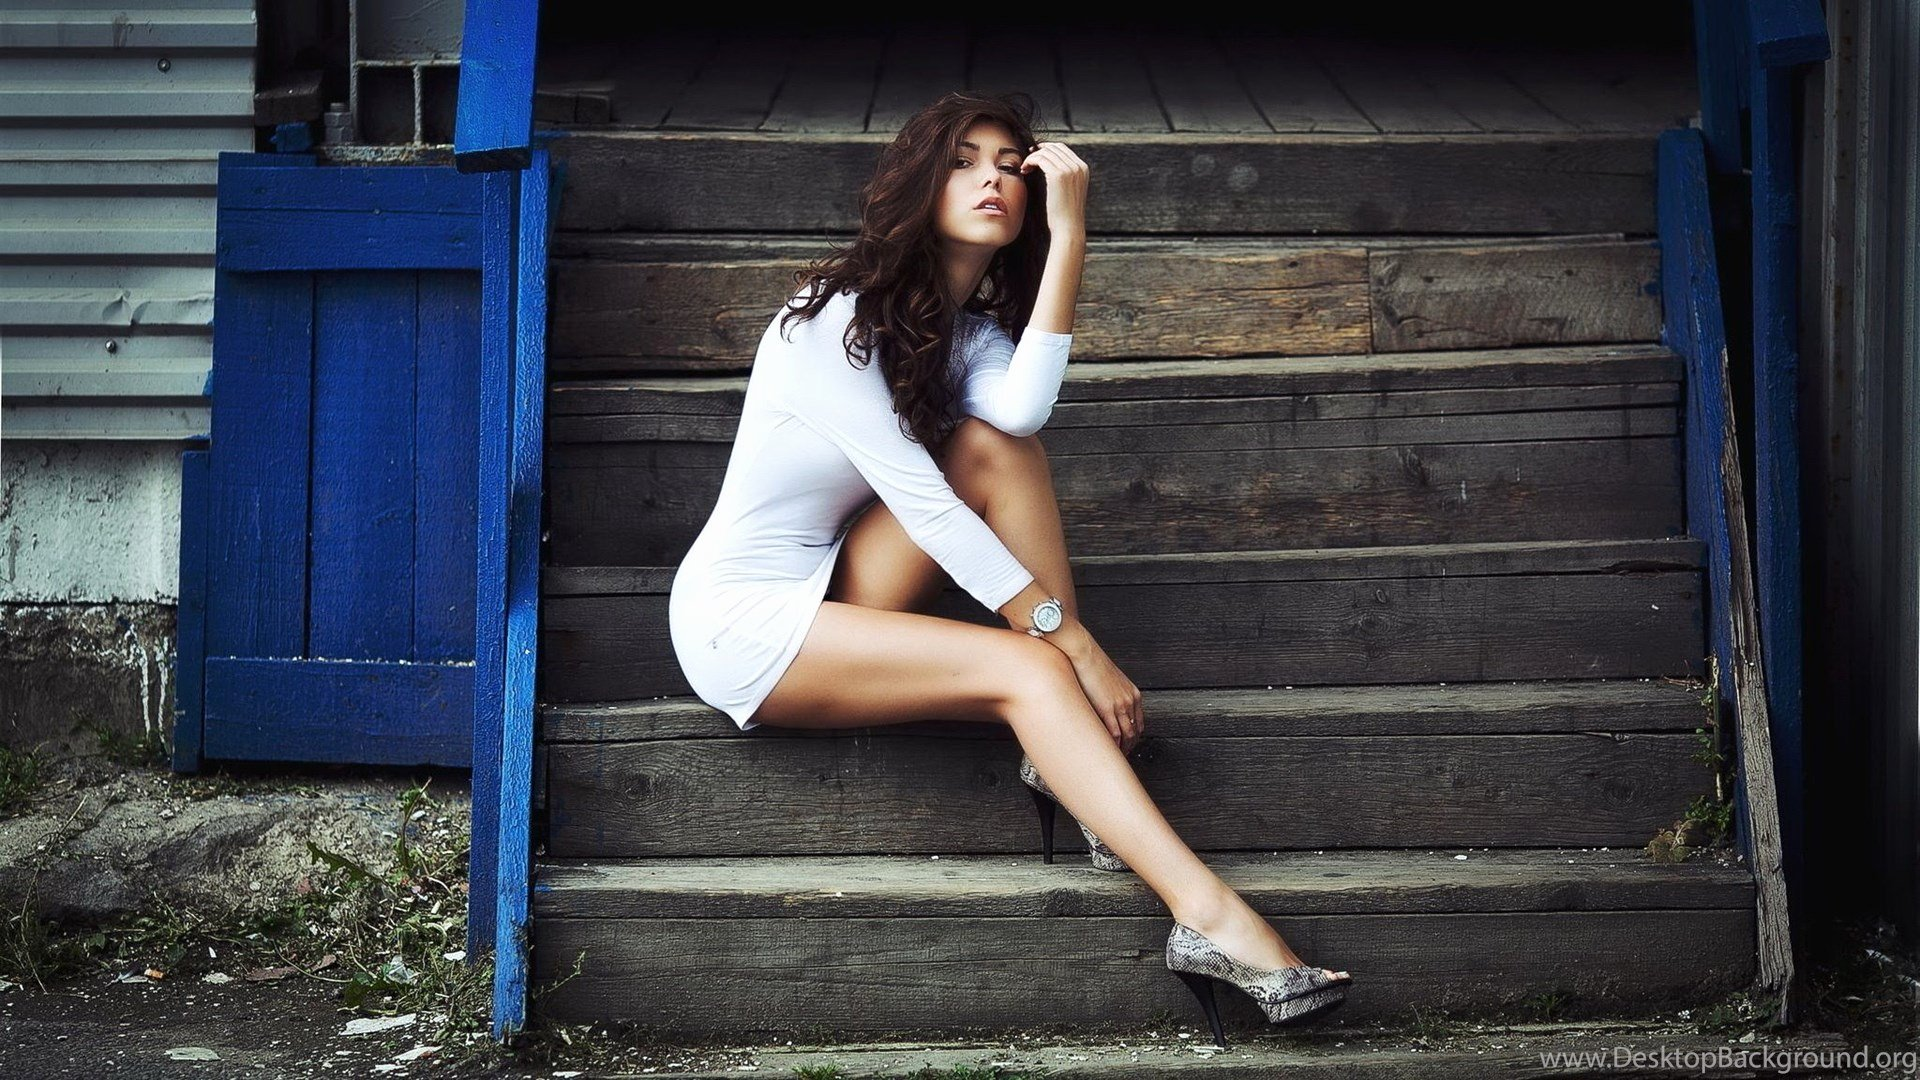 Pics Of Sexy Women Beautiful Hot Woman Legs Wallpapers Desktop Background